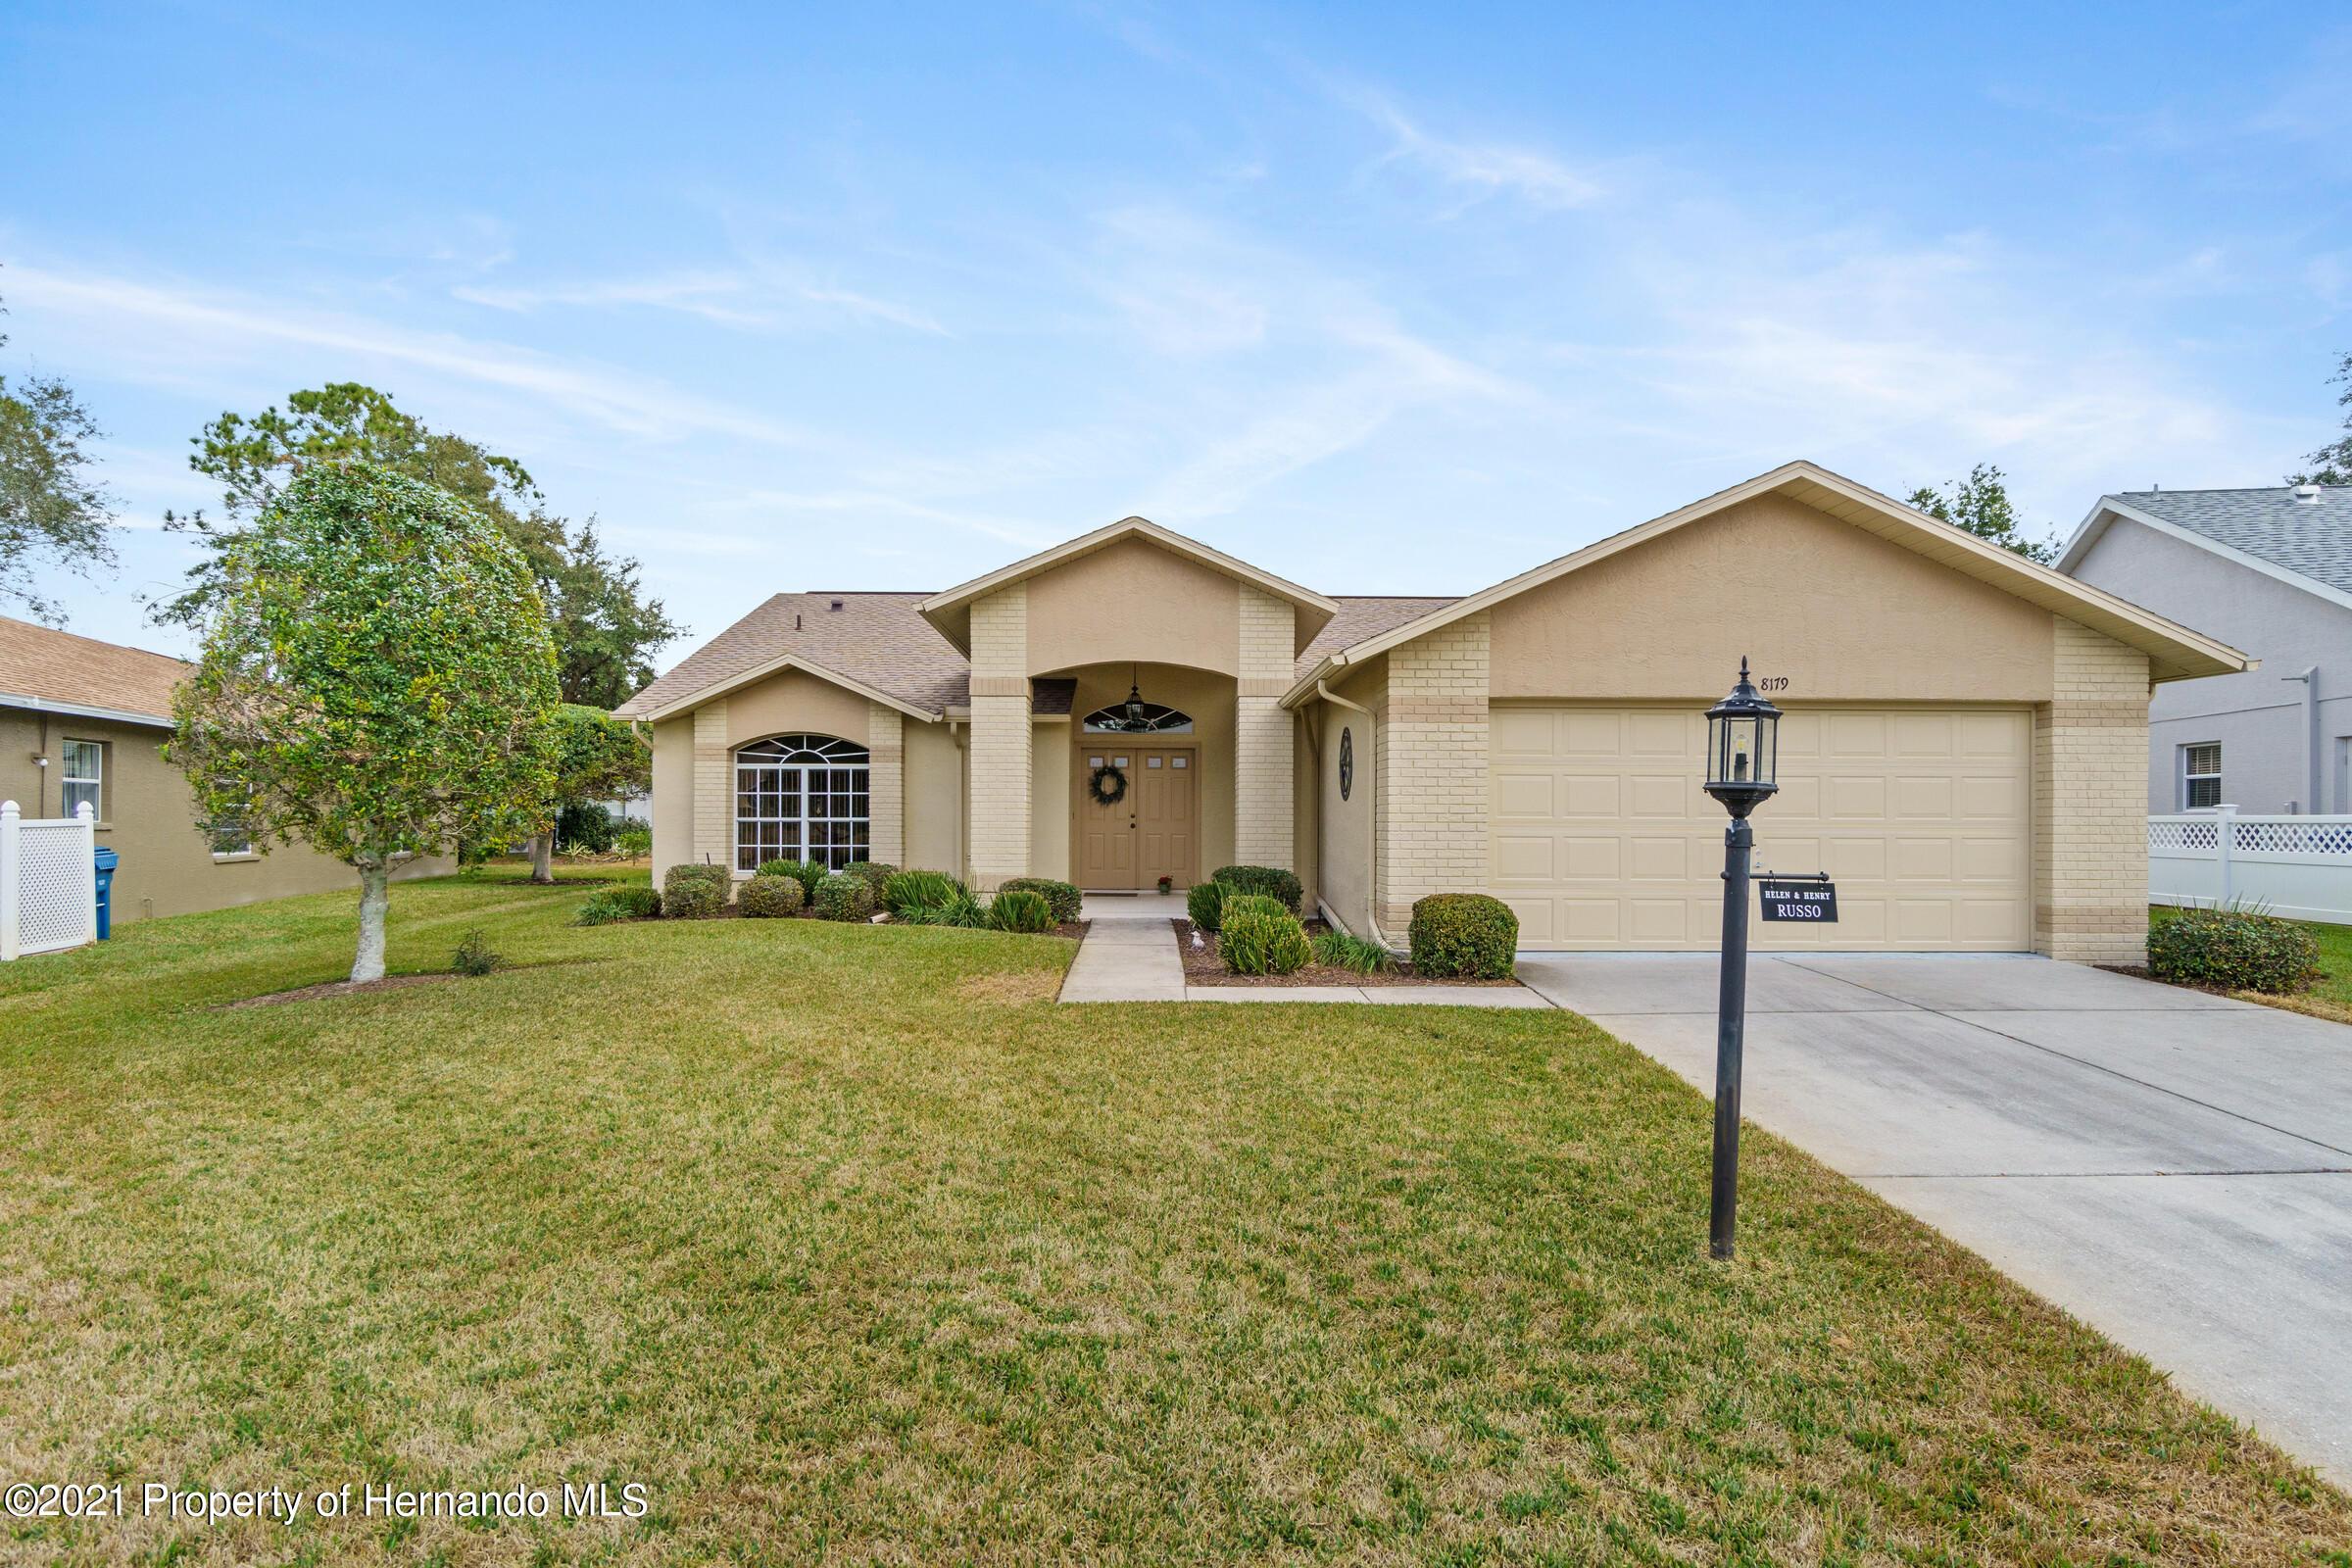 Details for 8179 Sugarbush Drive, Spring Hill, FL 34606